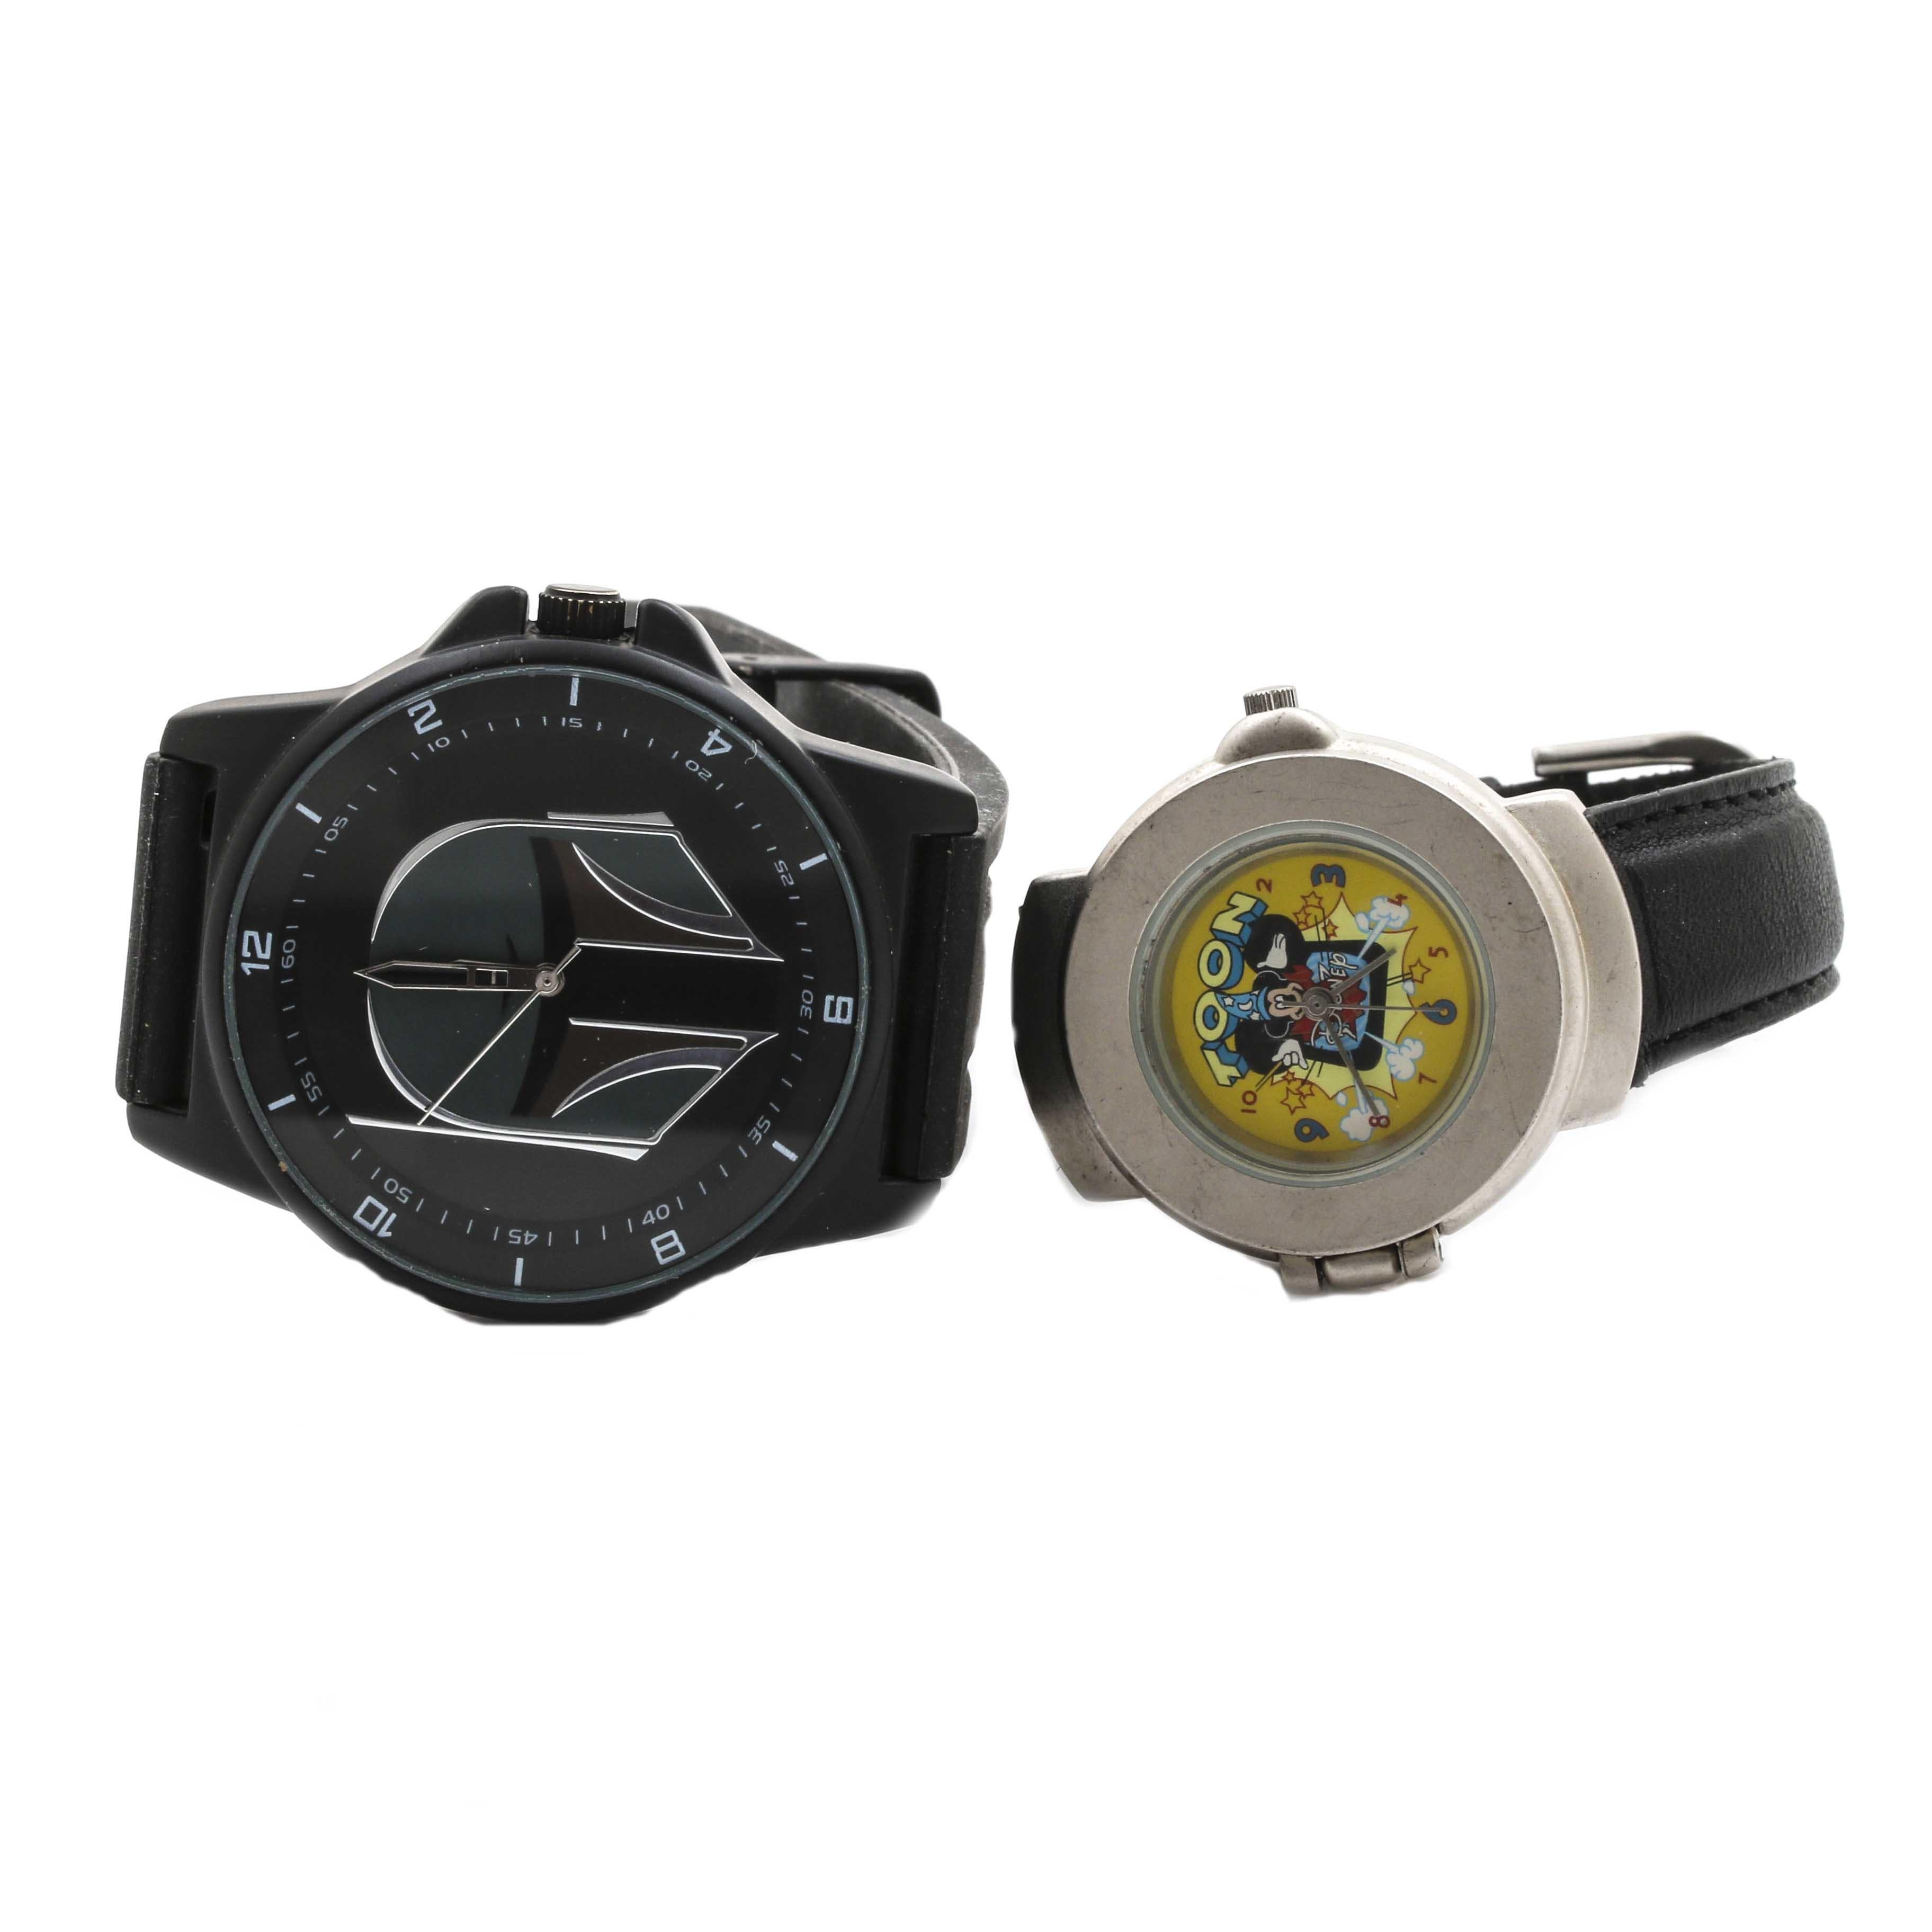 Toon Disney and Star Wars Wristwatch